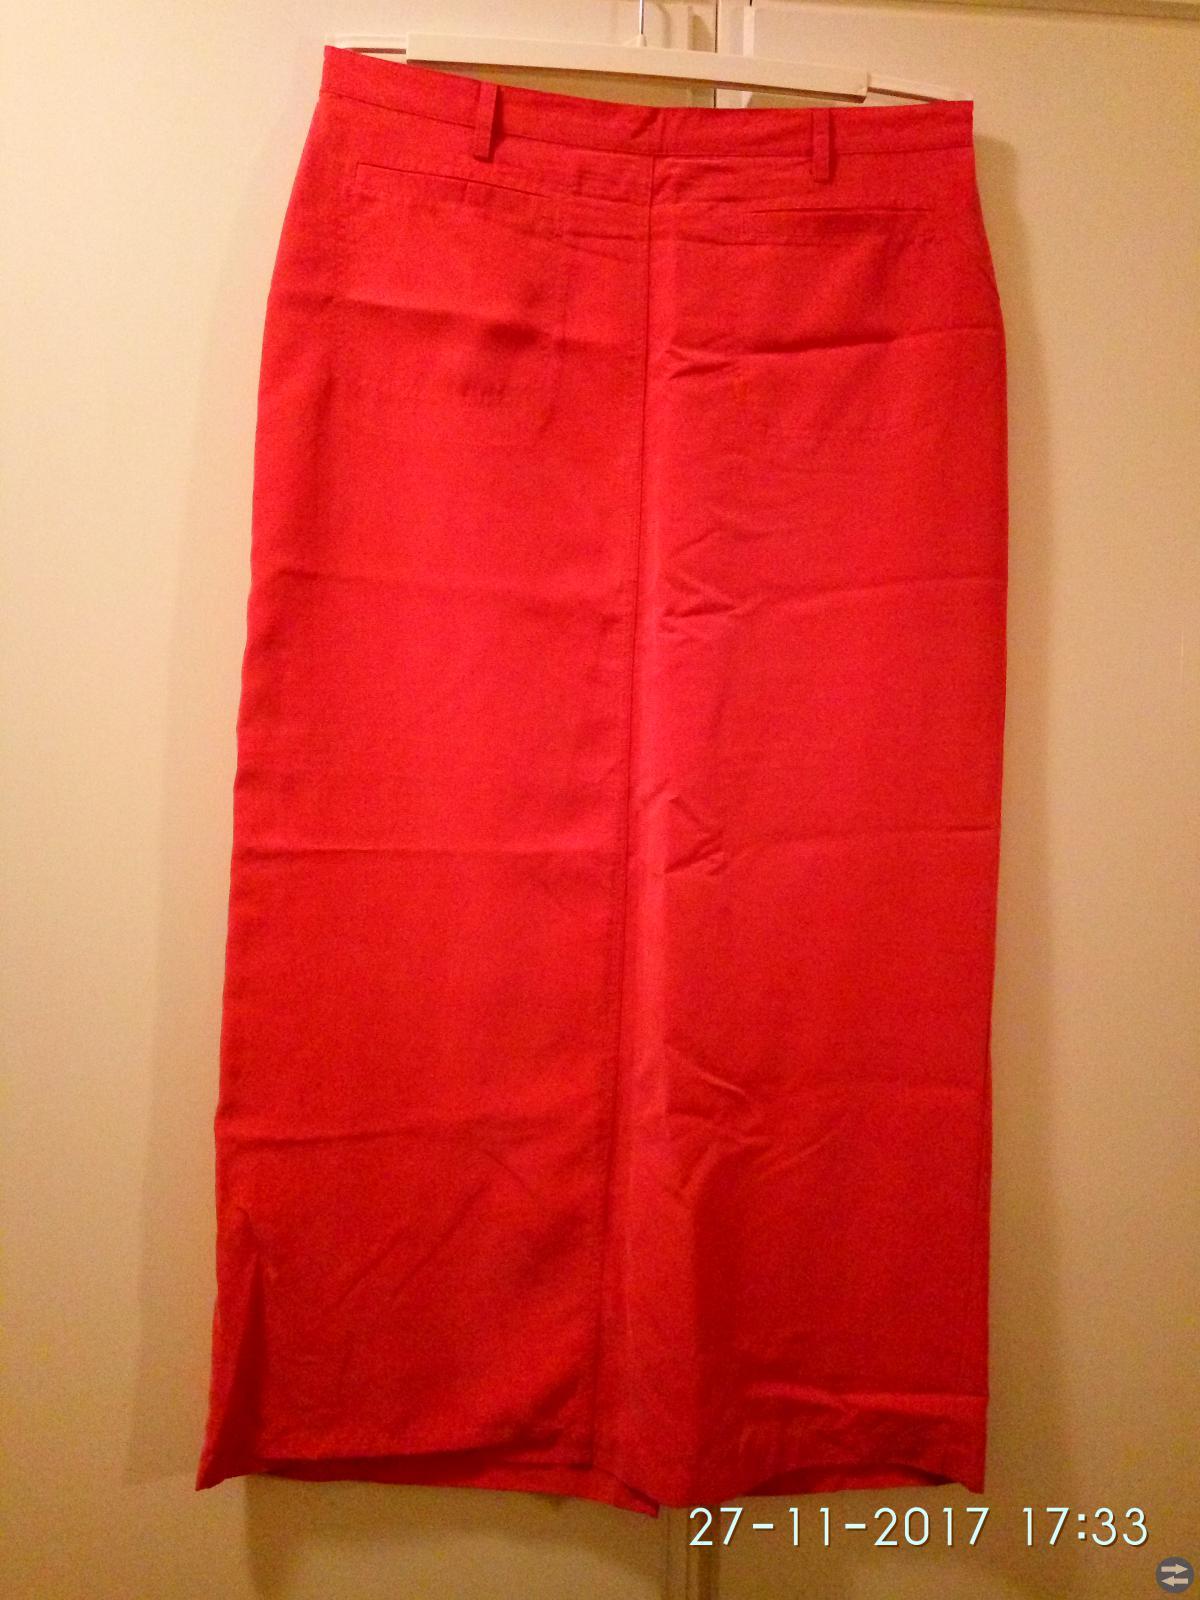 Lång kjol. Model: Cappuccini, 42 strl.